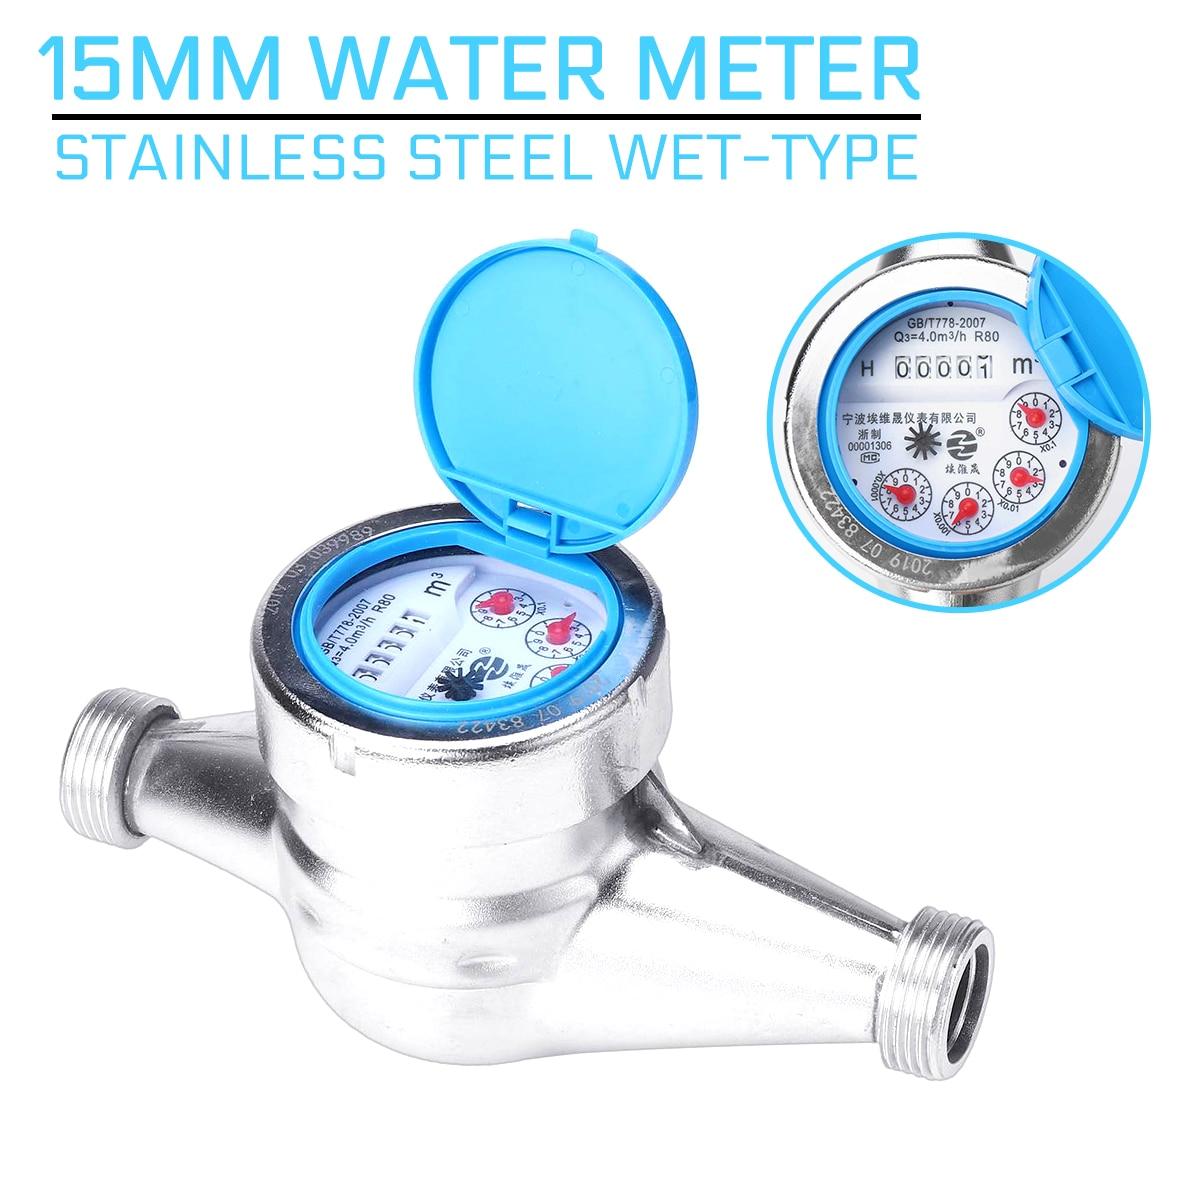 Water Meter Stainless Steel 15mm Wet-type Cold Water Meter Plastic Rotor Type Measuring Meter Tap Table Counter Home Garde Tools